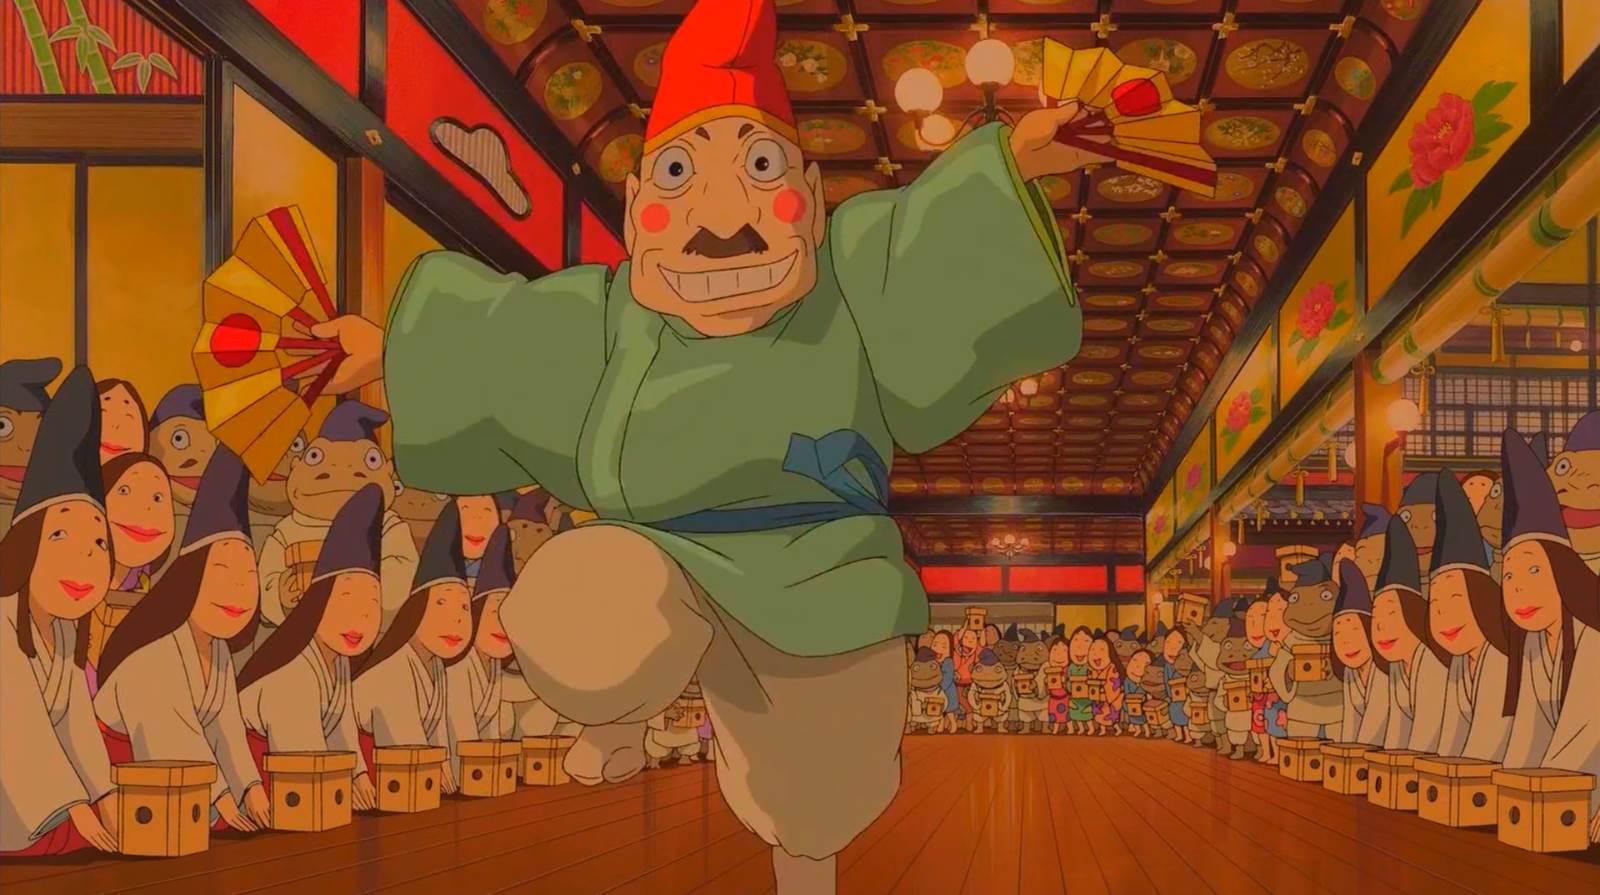 Sen to Chihiro no Kamikakushi, Rich man dance